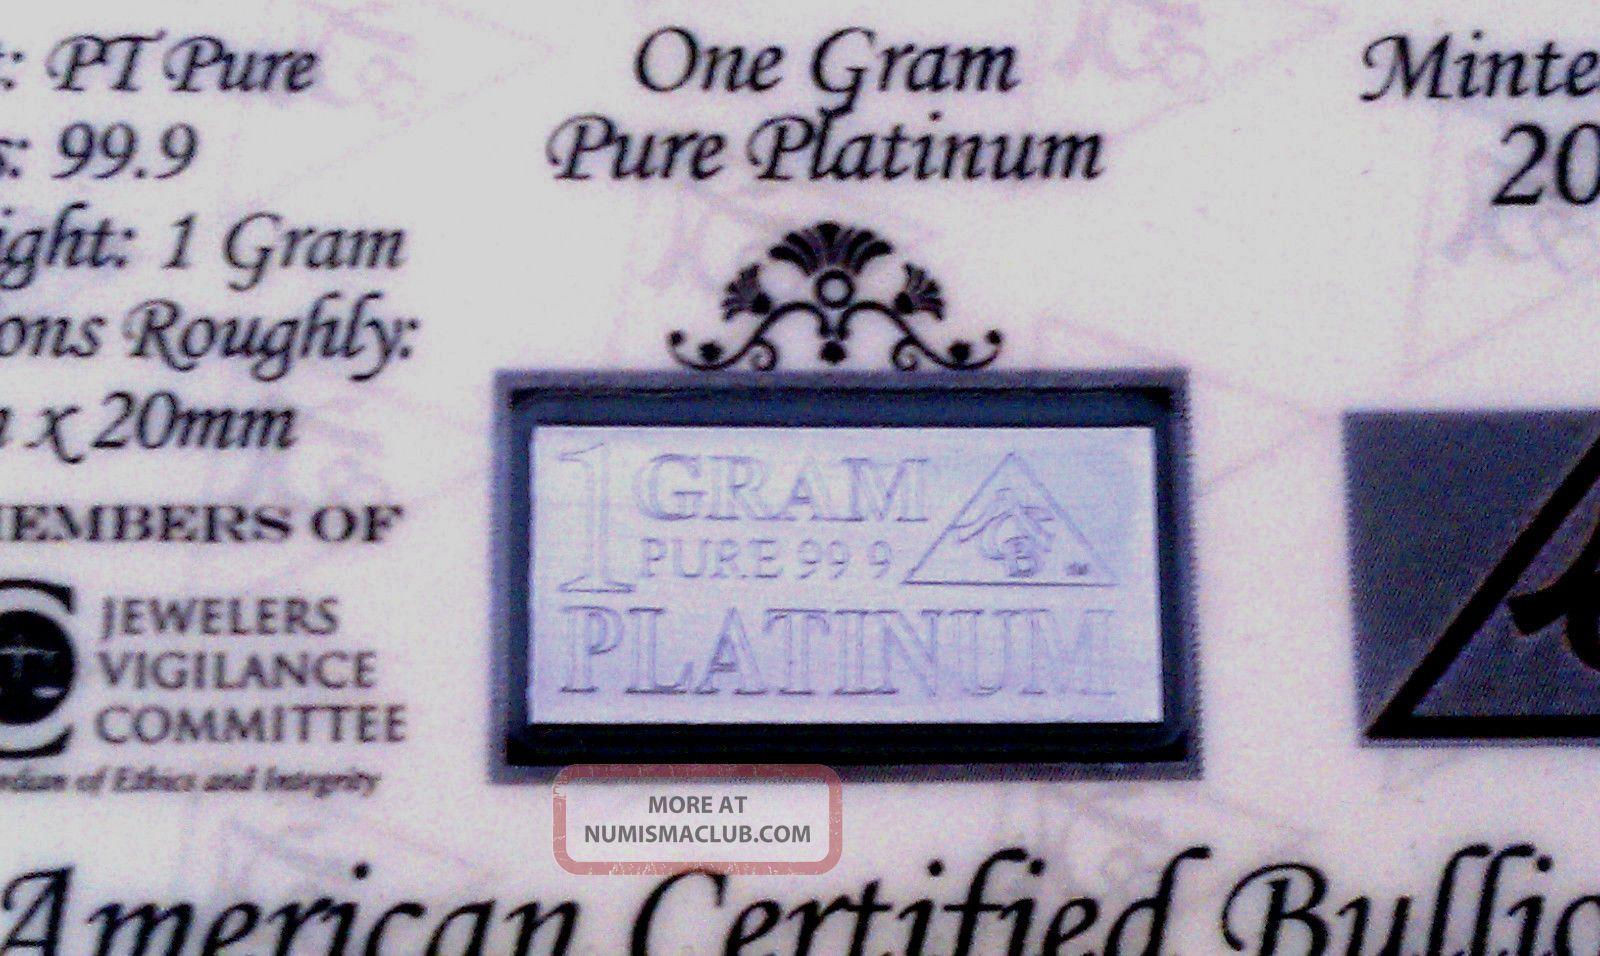 ACB PLATINUM 1 GRAM PURE PT BULLION MINTED BAR 99.9 FINE with CERTIFICATE